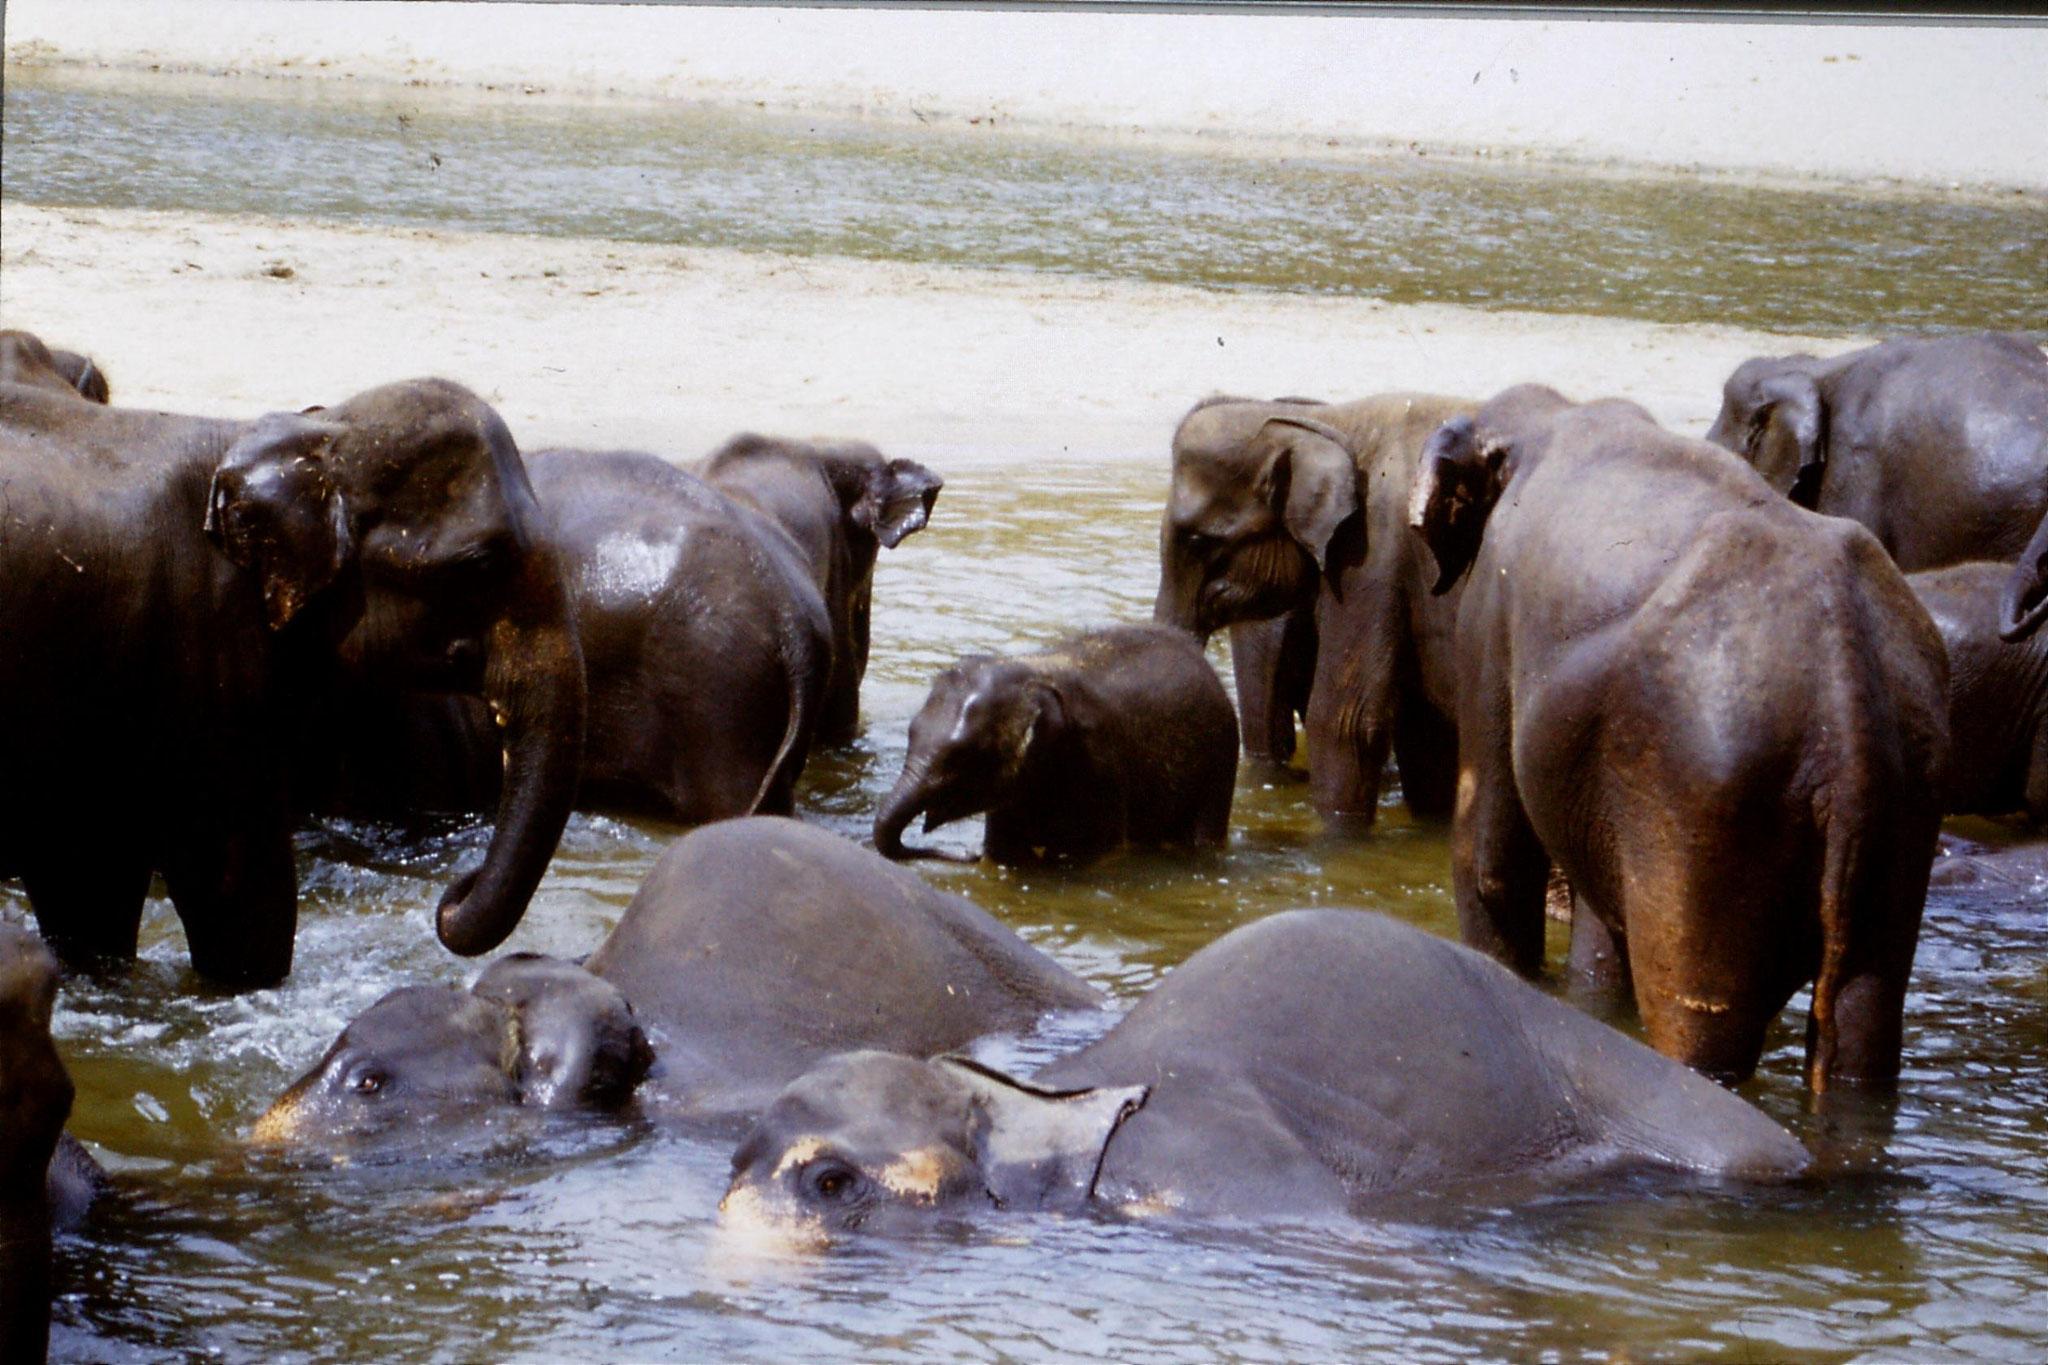 10/2/1990: 13: Kegalla elephant orphanage